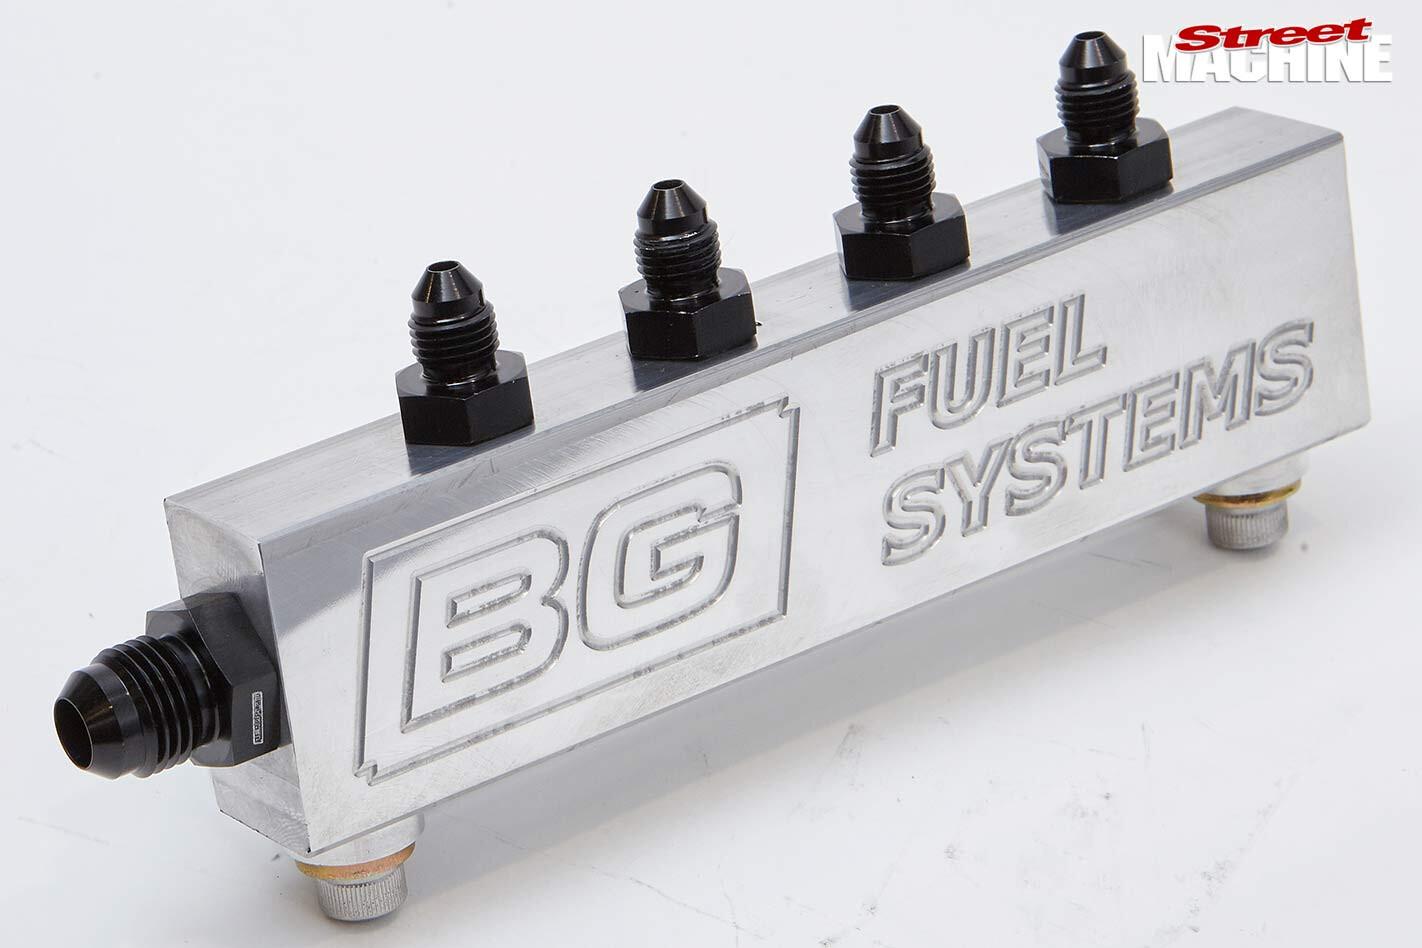 BG fuel systems